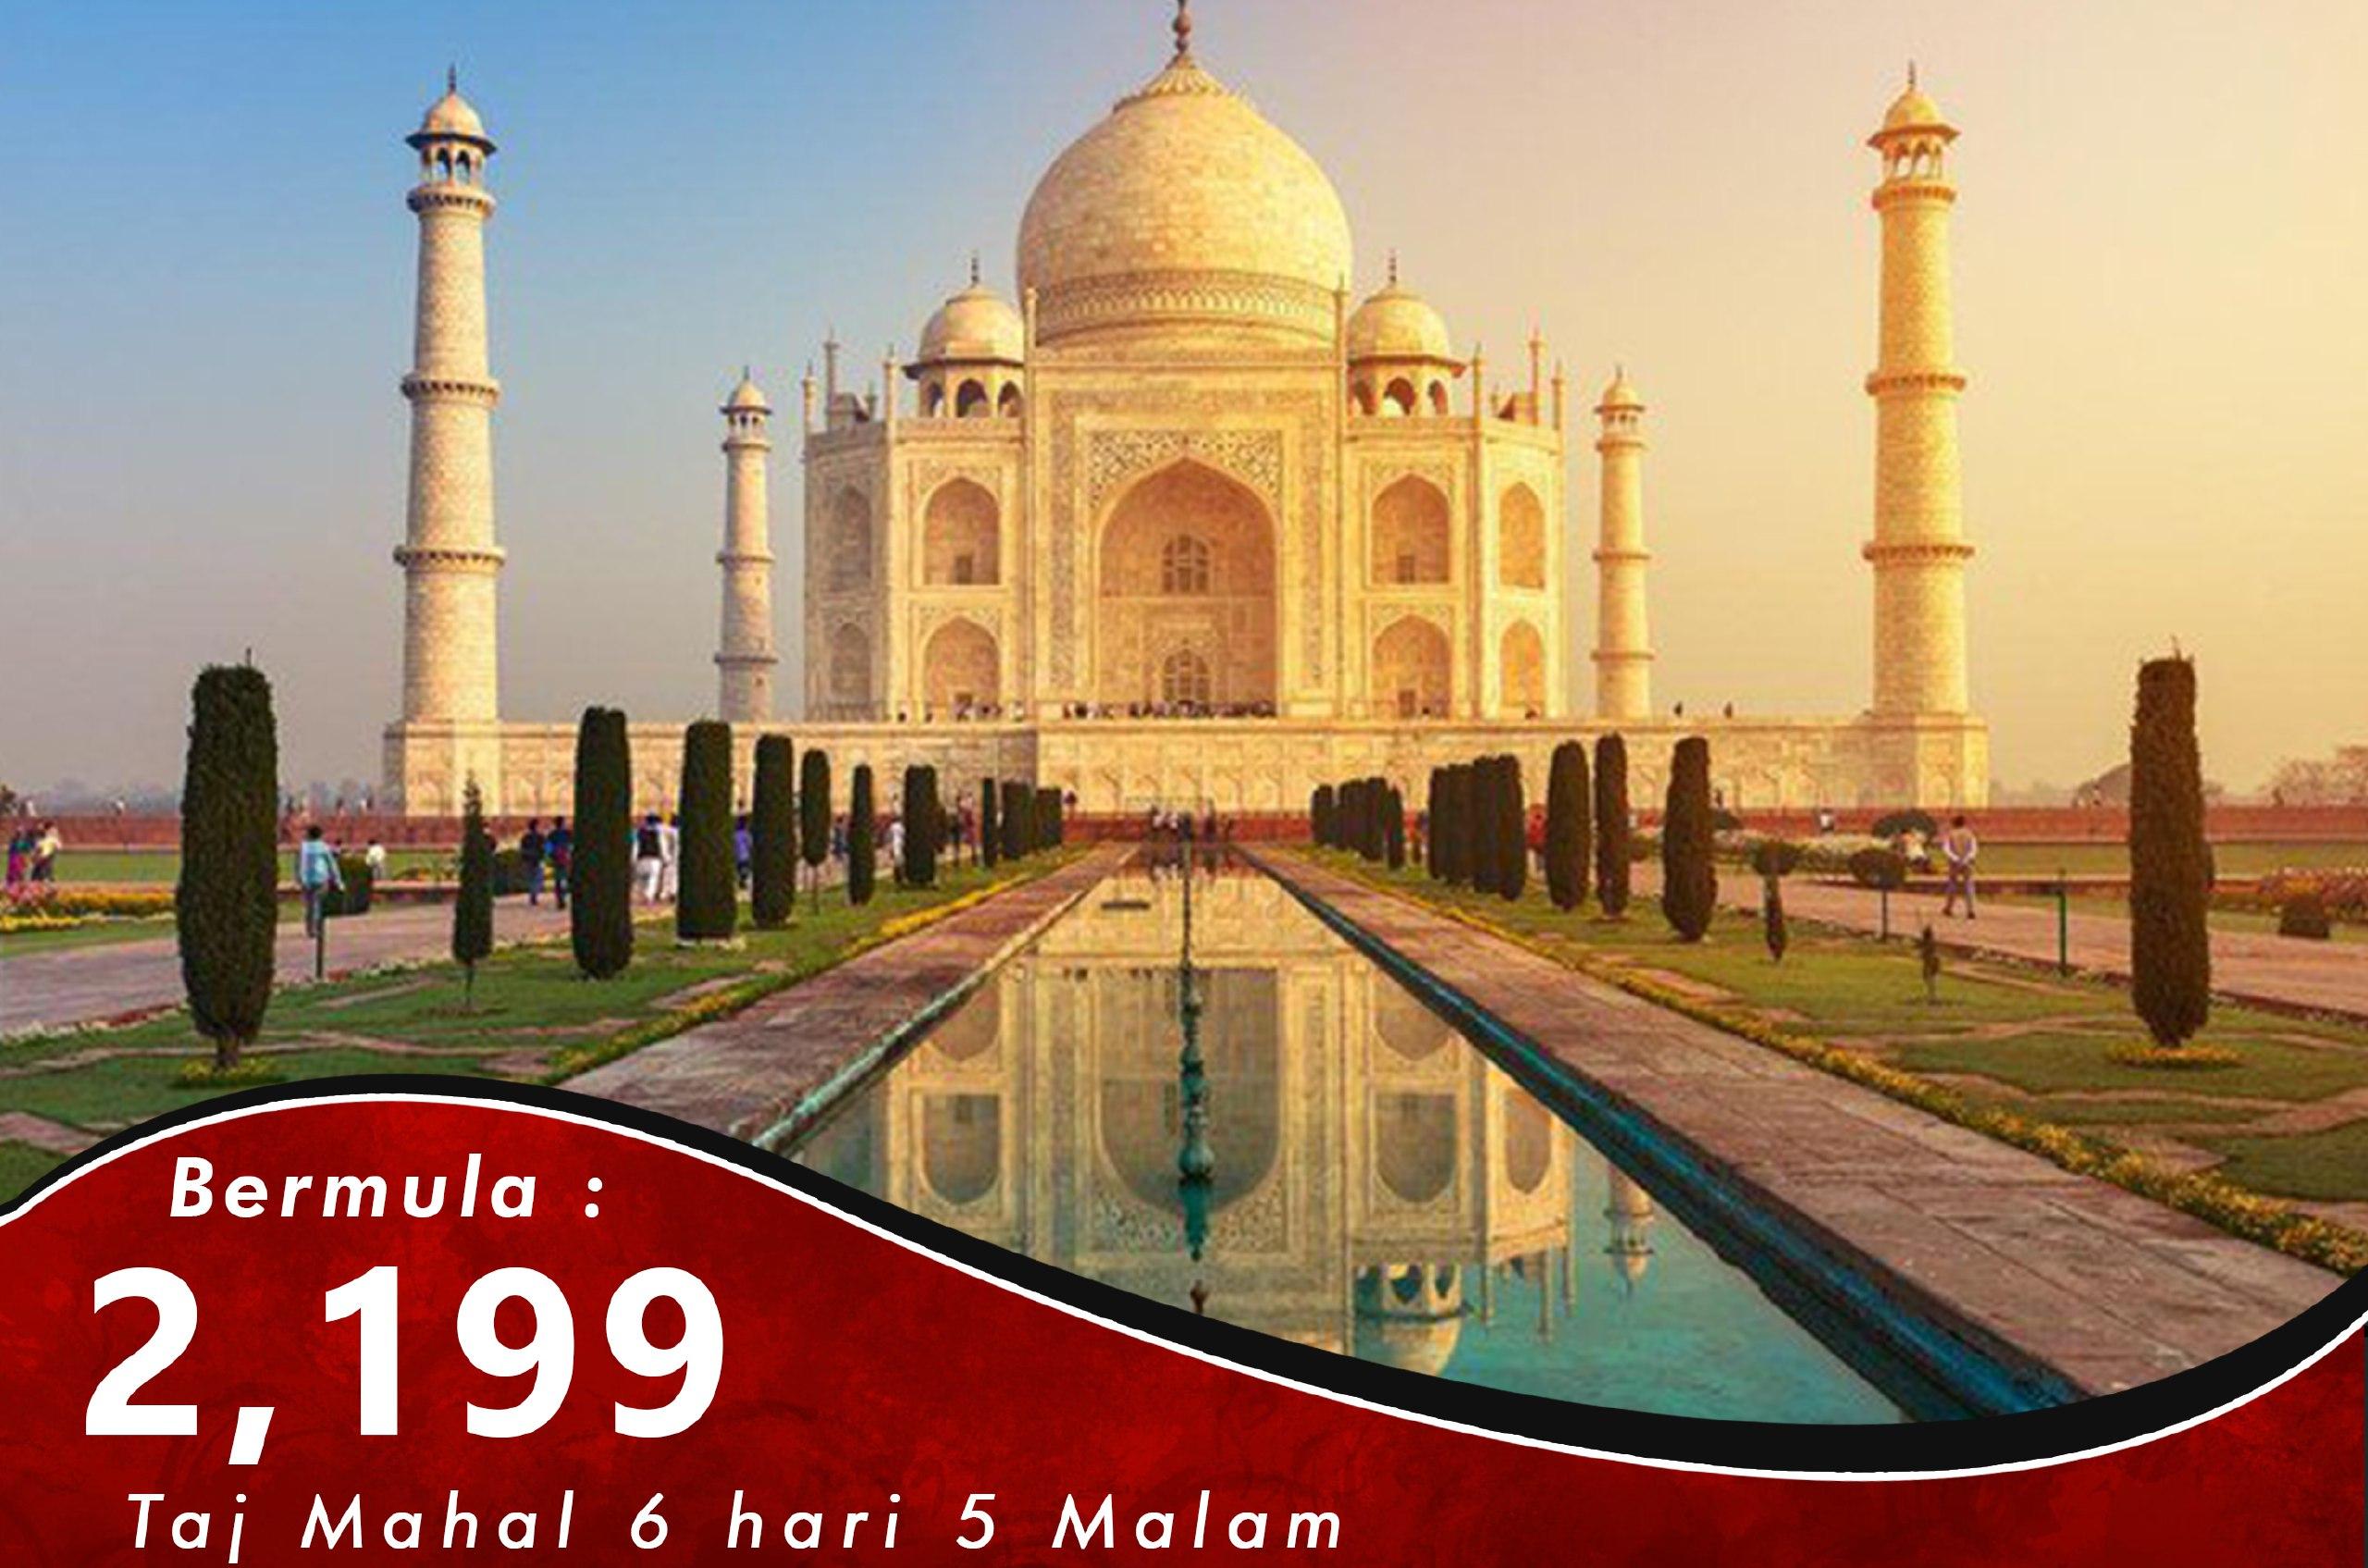 Kashmir 6 Hari 5 Malam Taj Mahal Tour